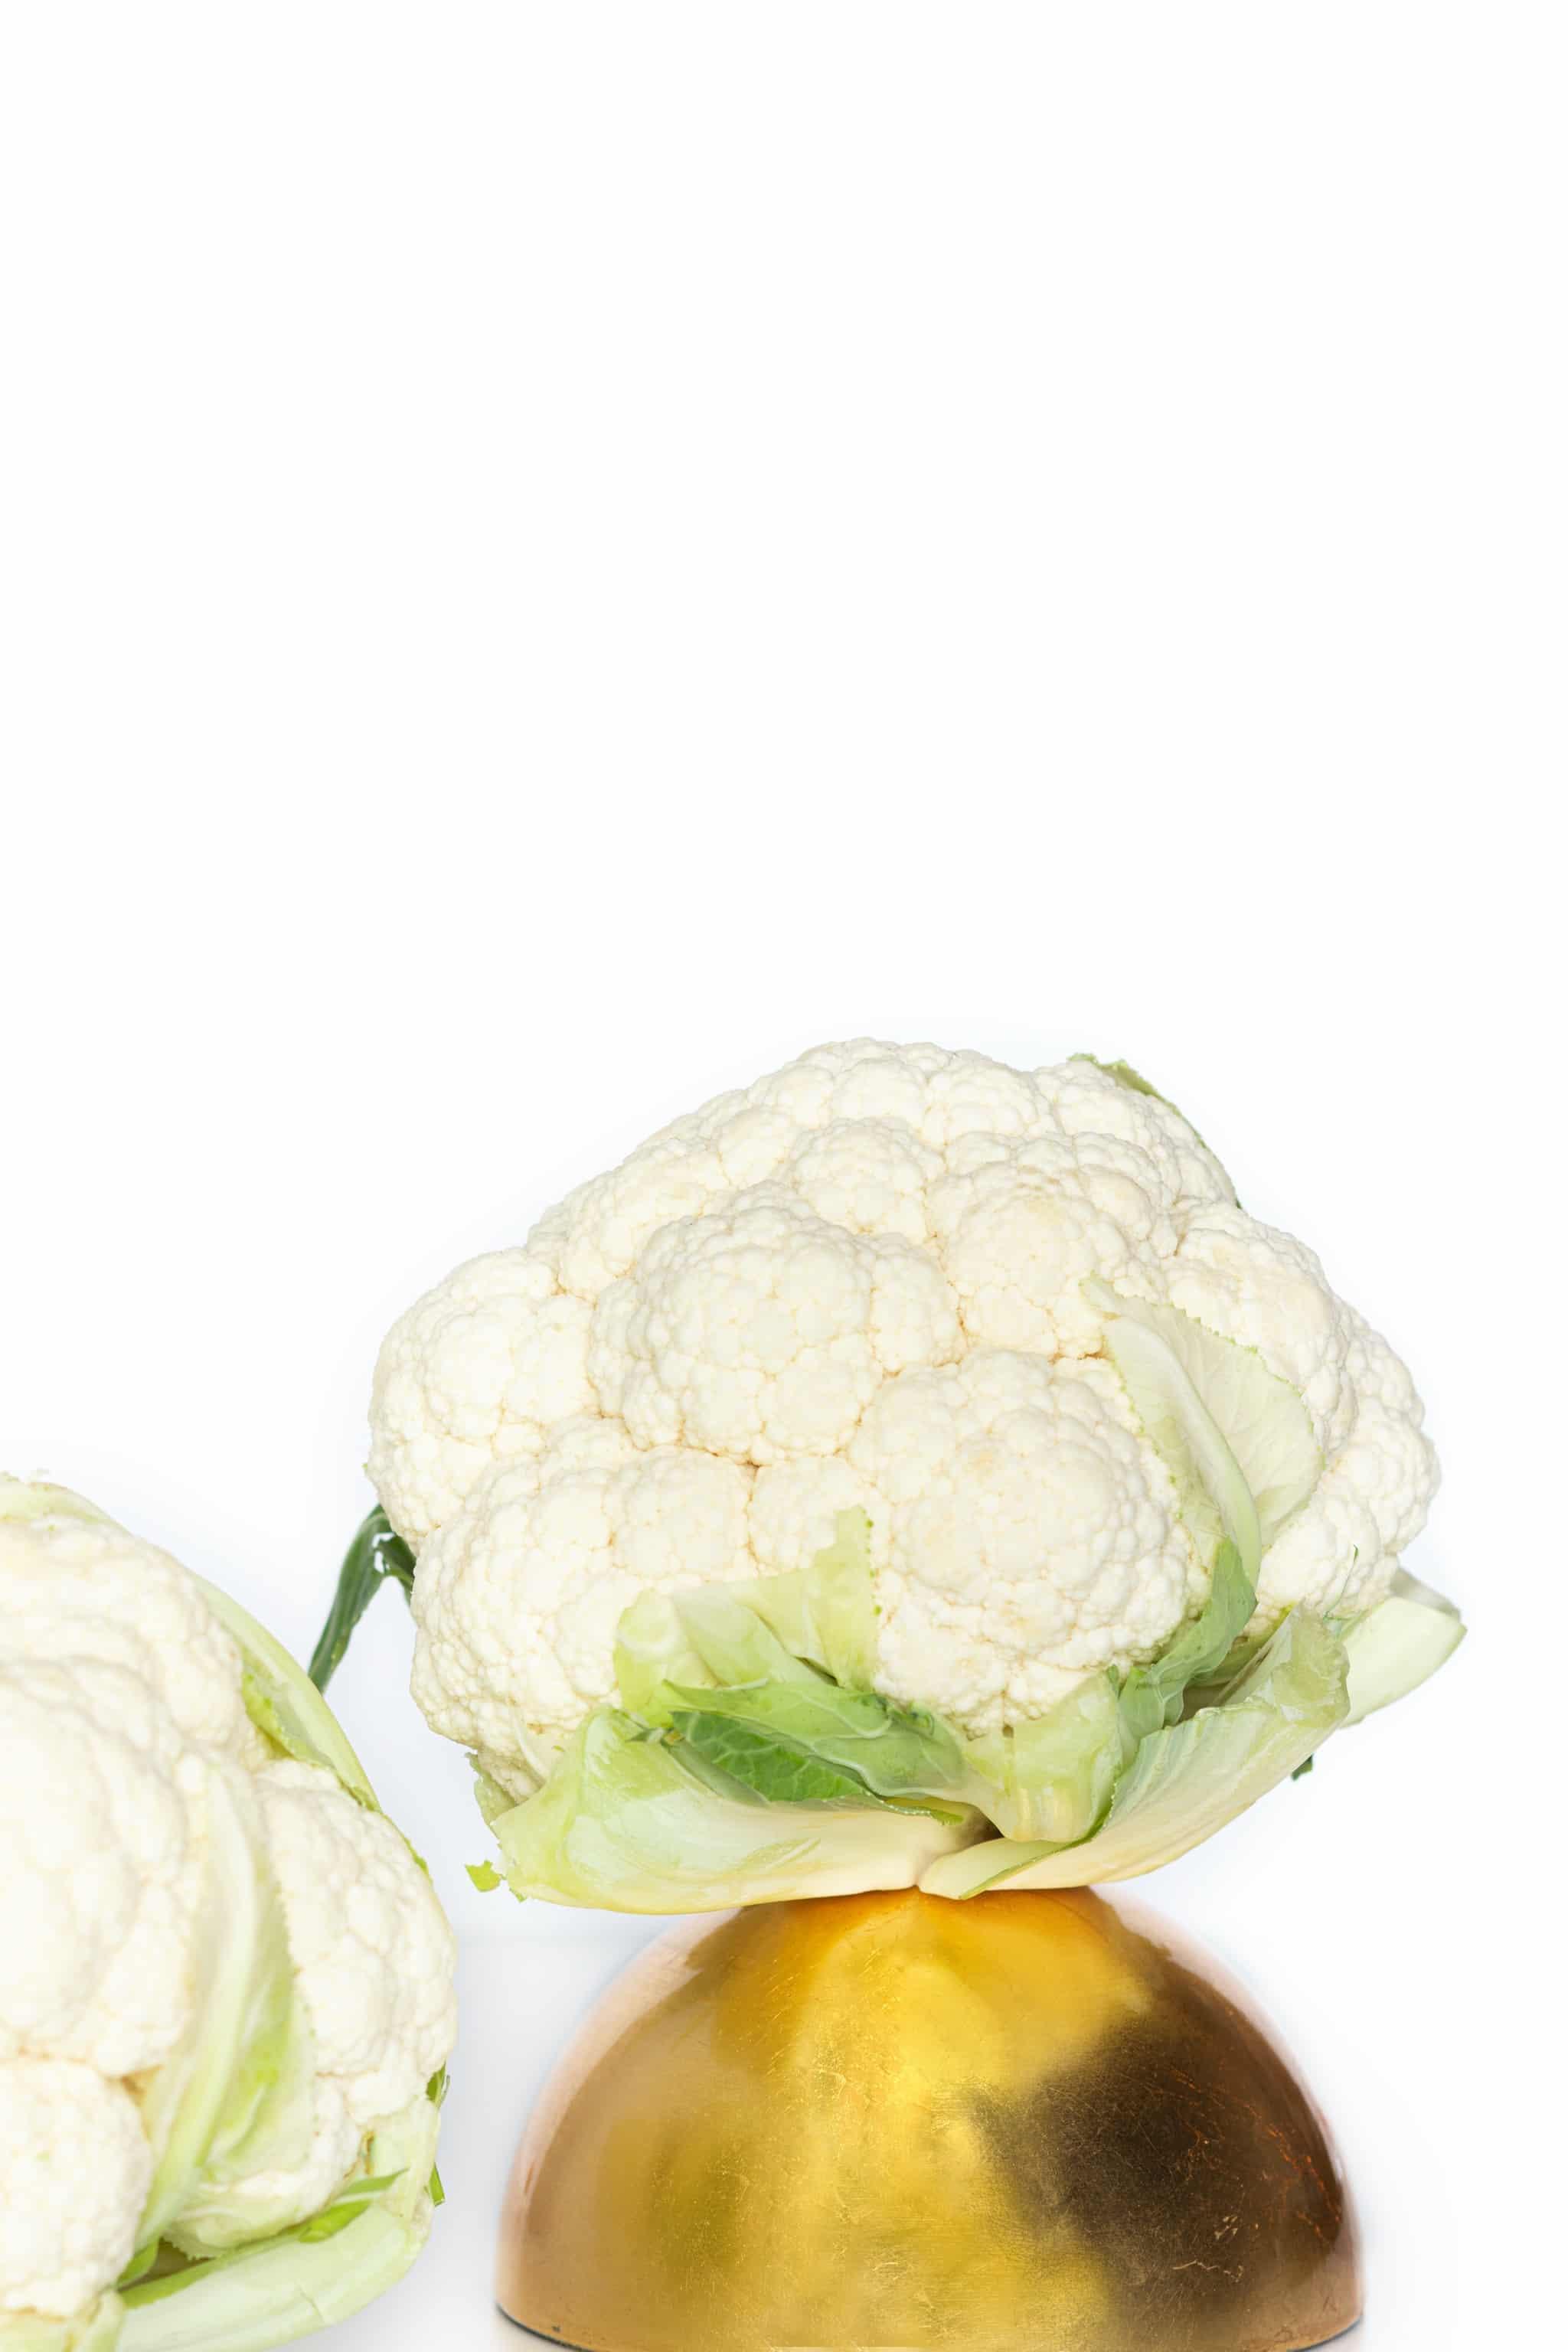 cauliflower sitting on gold bowl